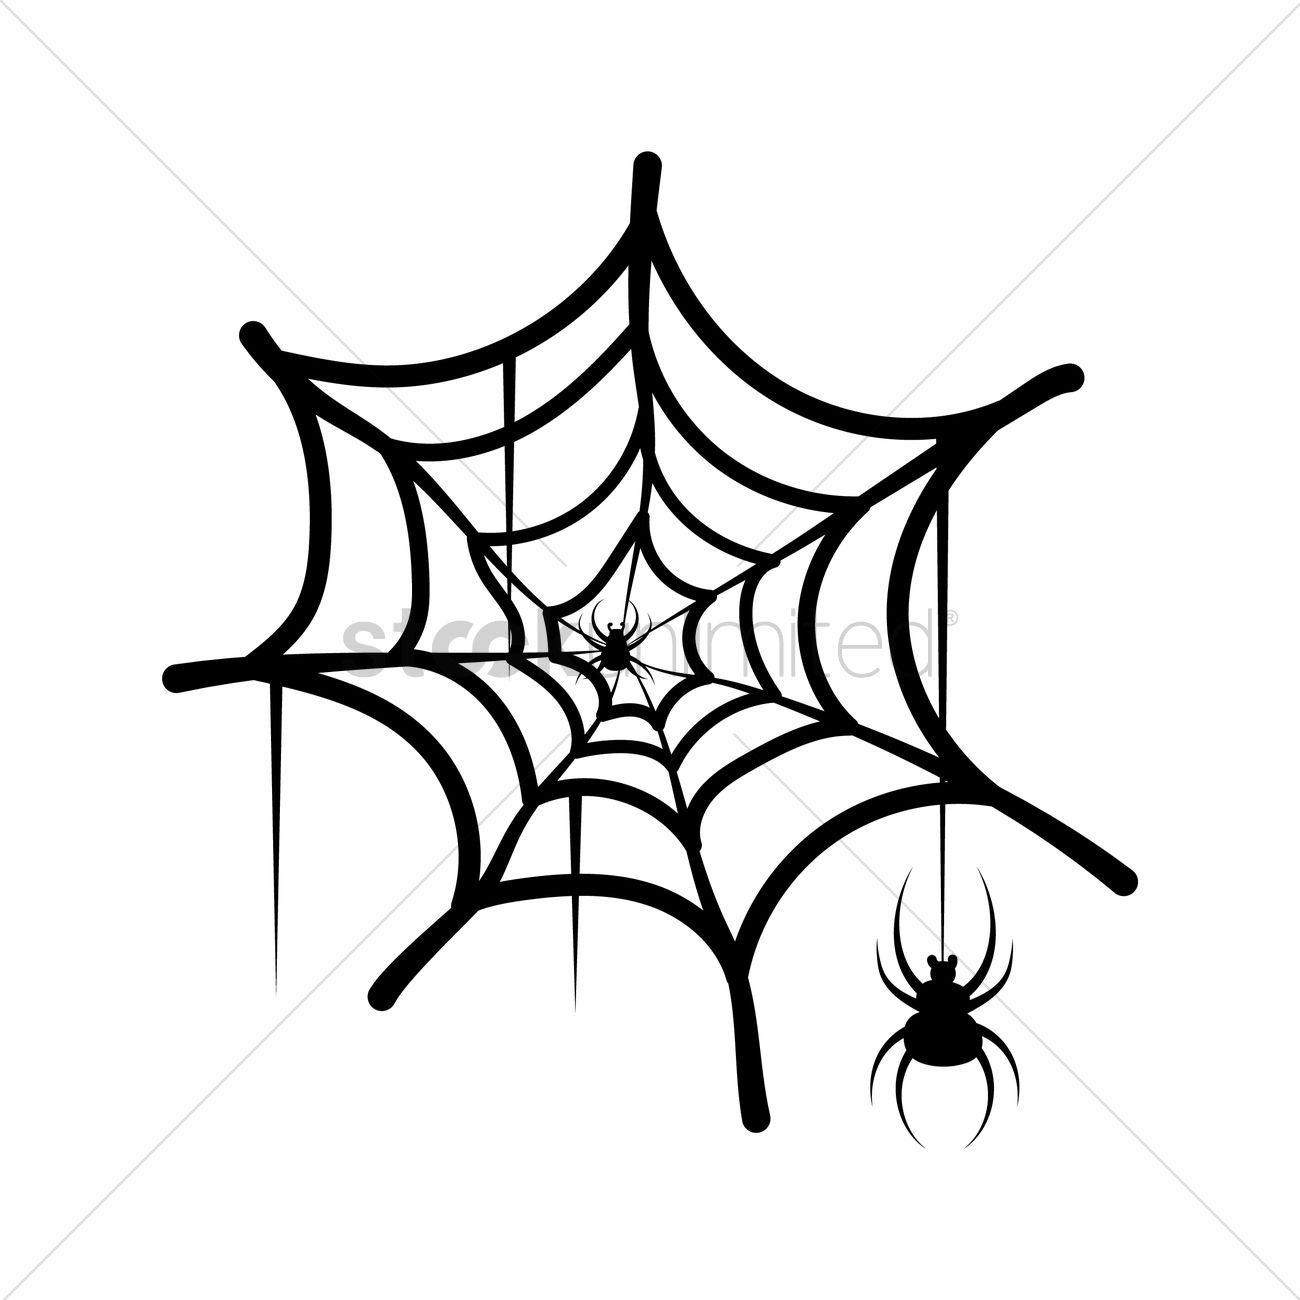 1300x1300 Spider Web Vector Image